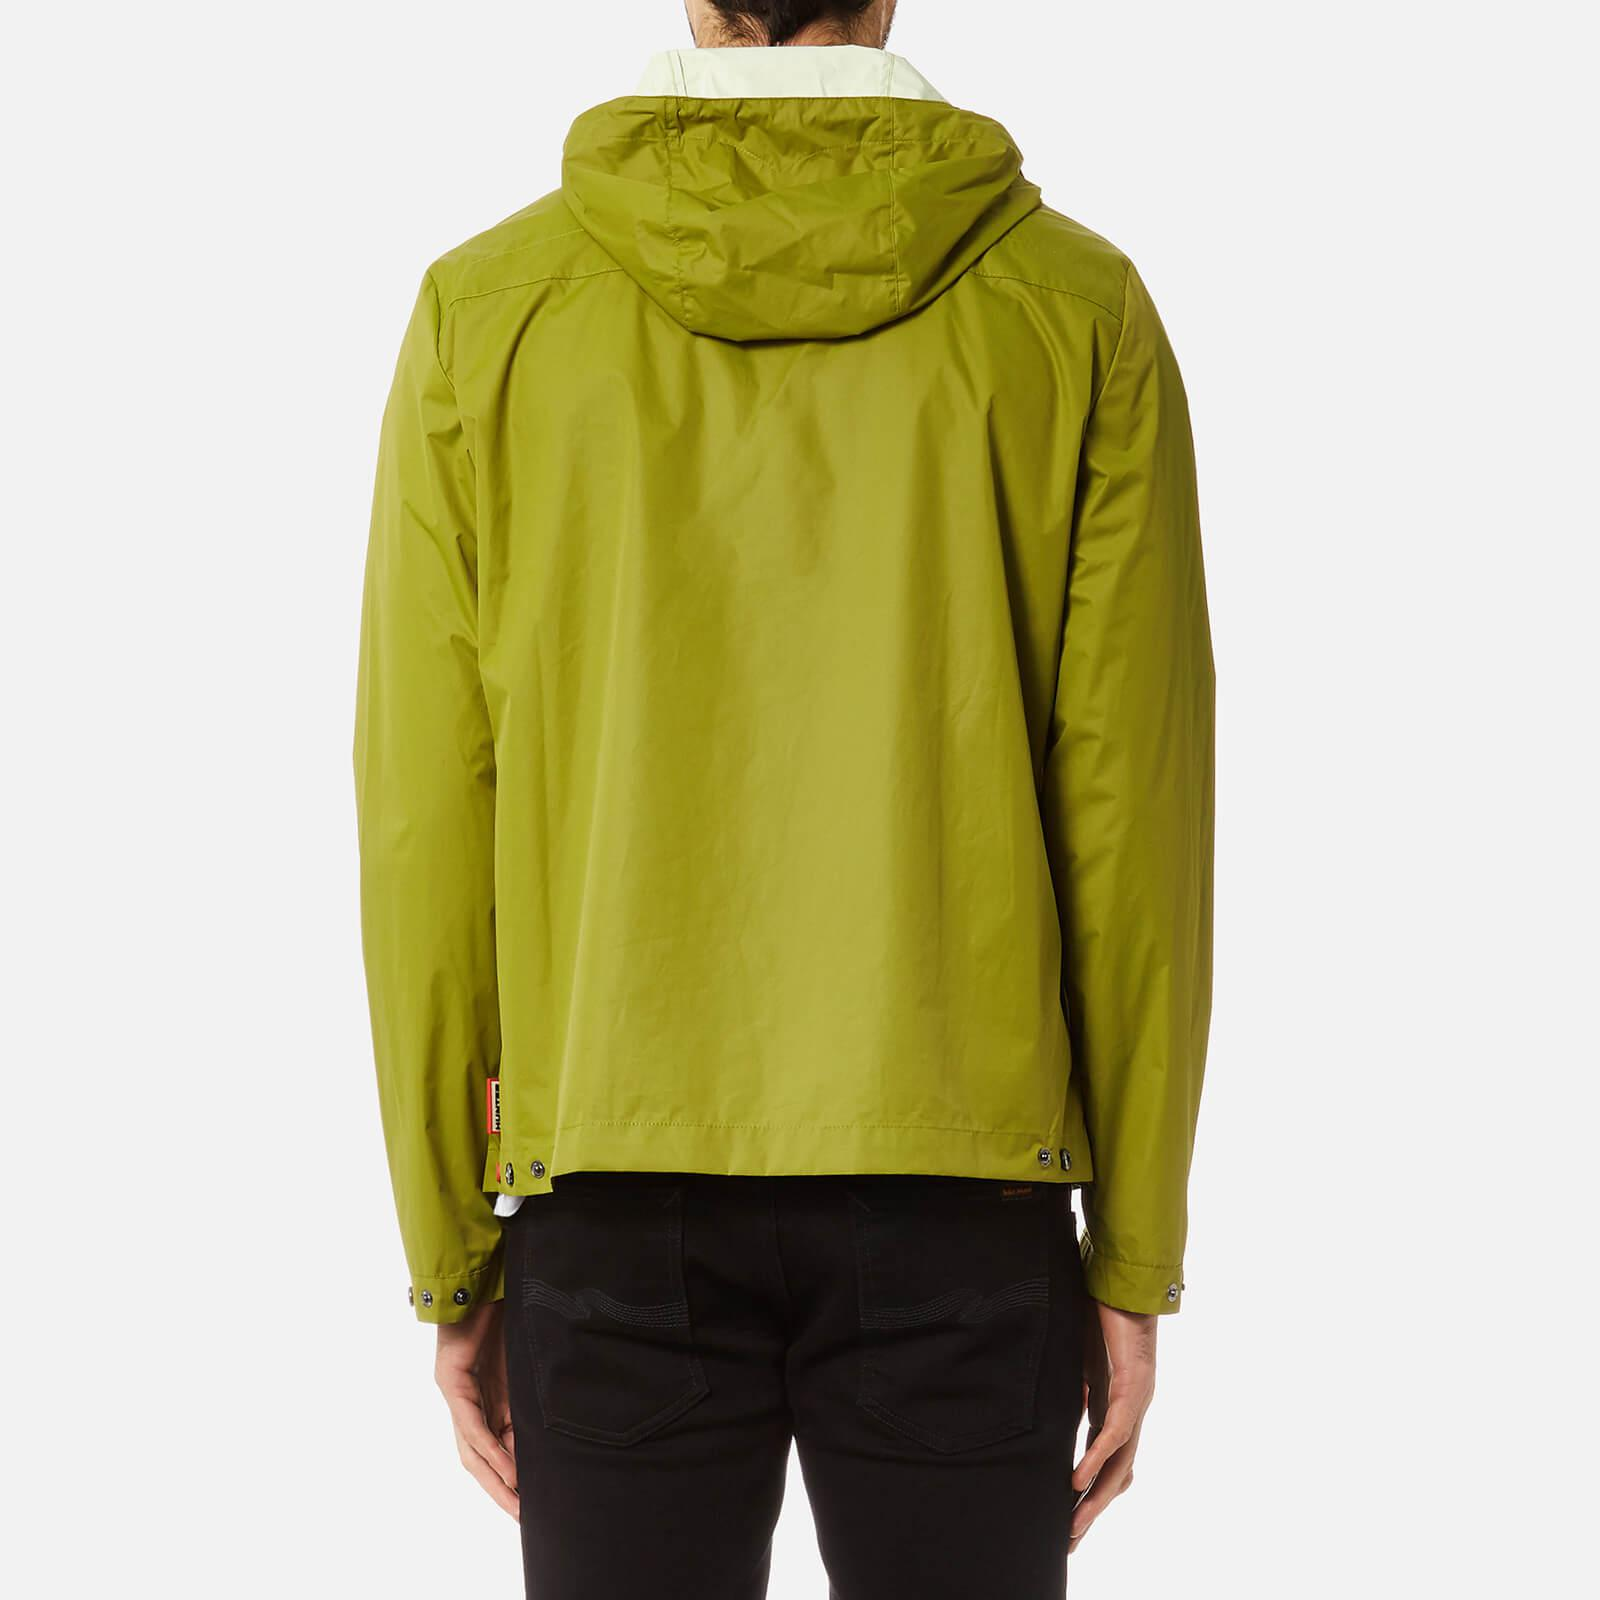 HUNTER Synthetic Original 2 Layer Lightweight Blouson Jacket in Green for Men